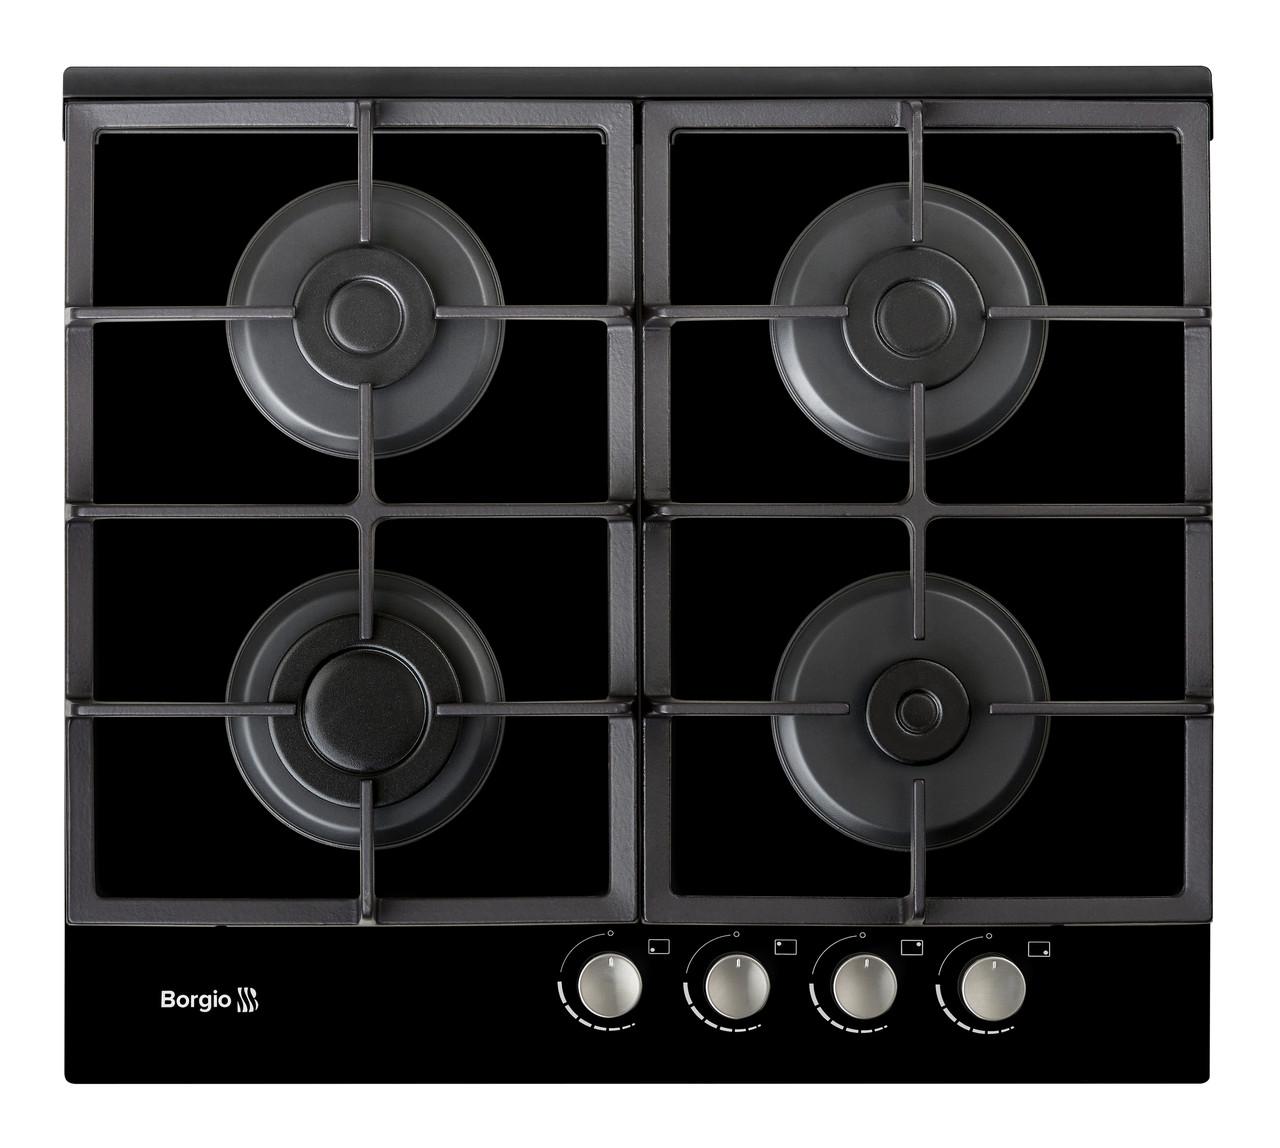 Варильна поверхня газова BORGIO 6270-17 (Black Glass)